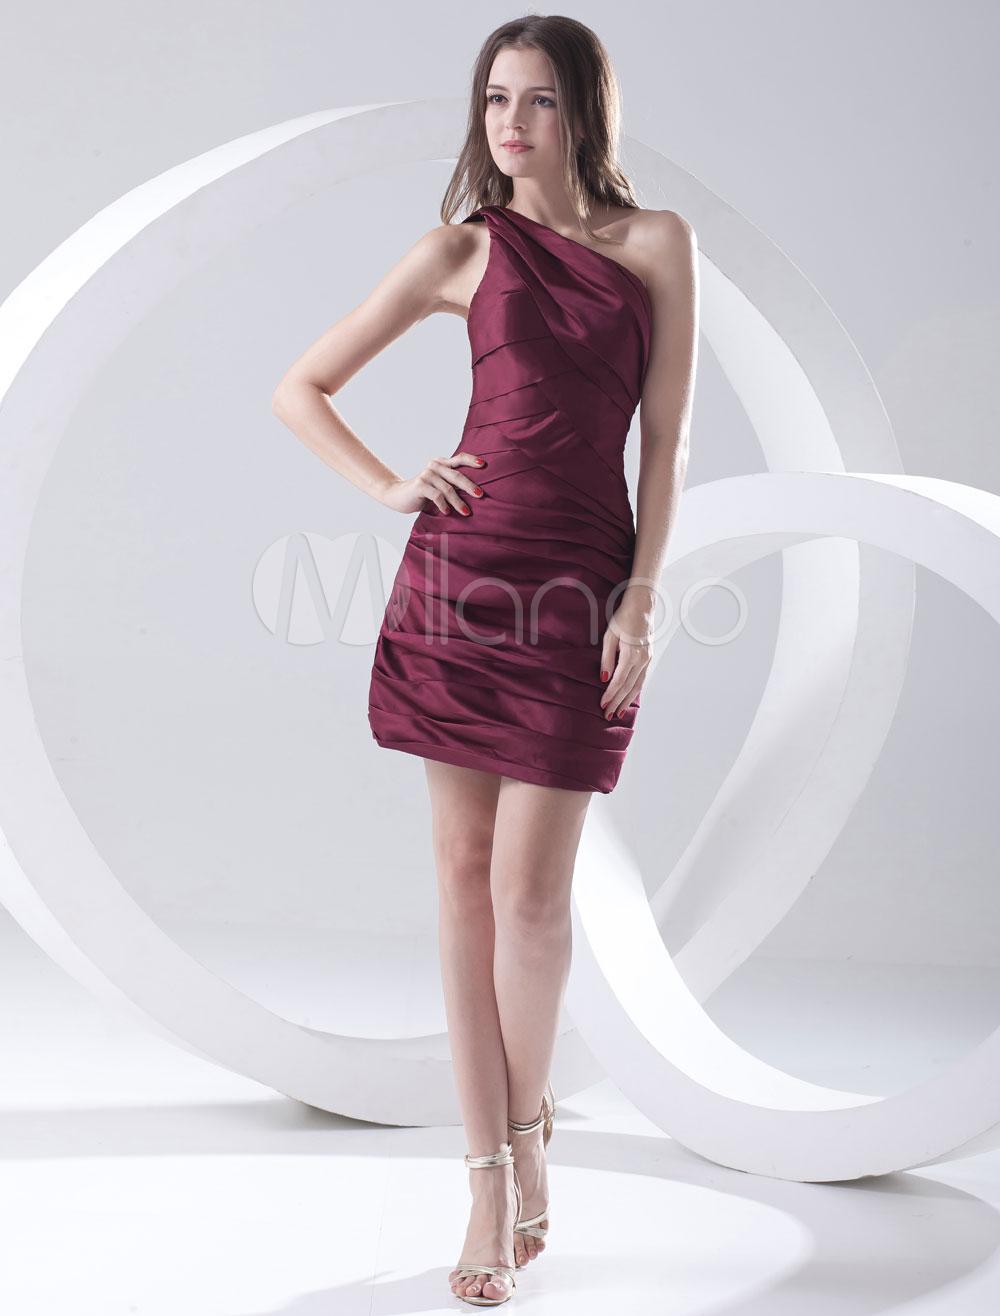 Sheath Burgundy Satin Ruched One-Shoulder Short Fashion Cocktail Dress